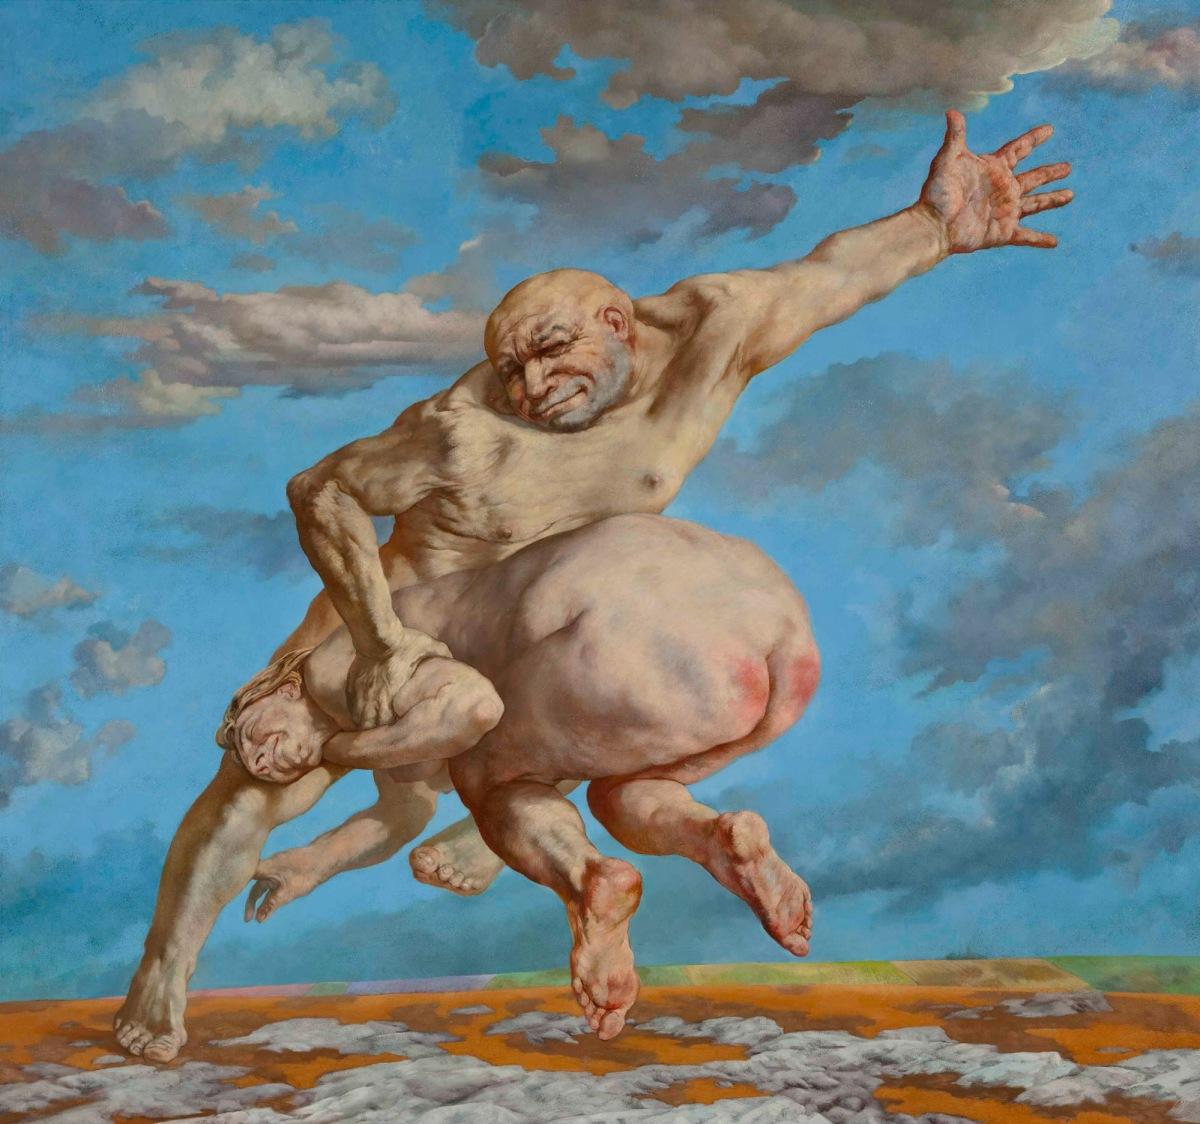 Sasha Okun  A Man and a Woman , 2008 - 2012 Oil on board 196.5 x 209 cm